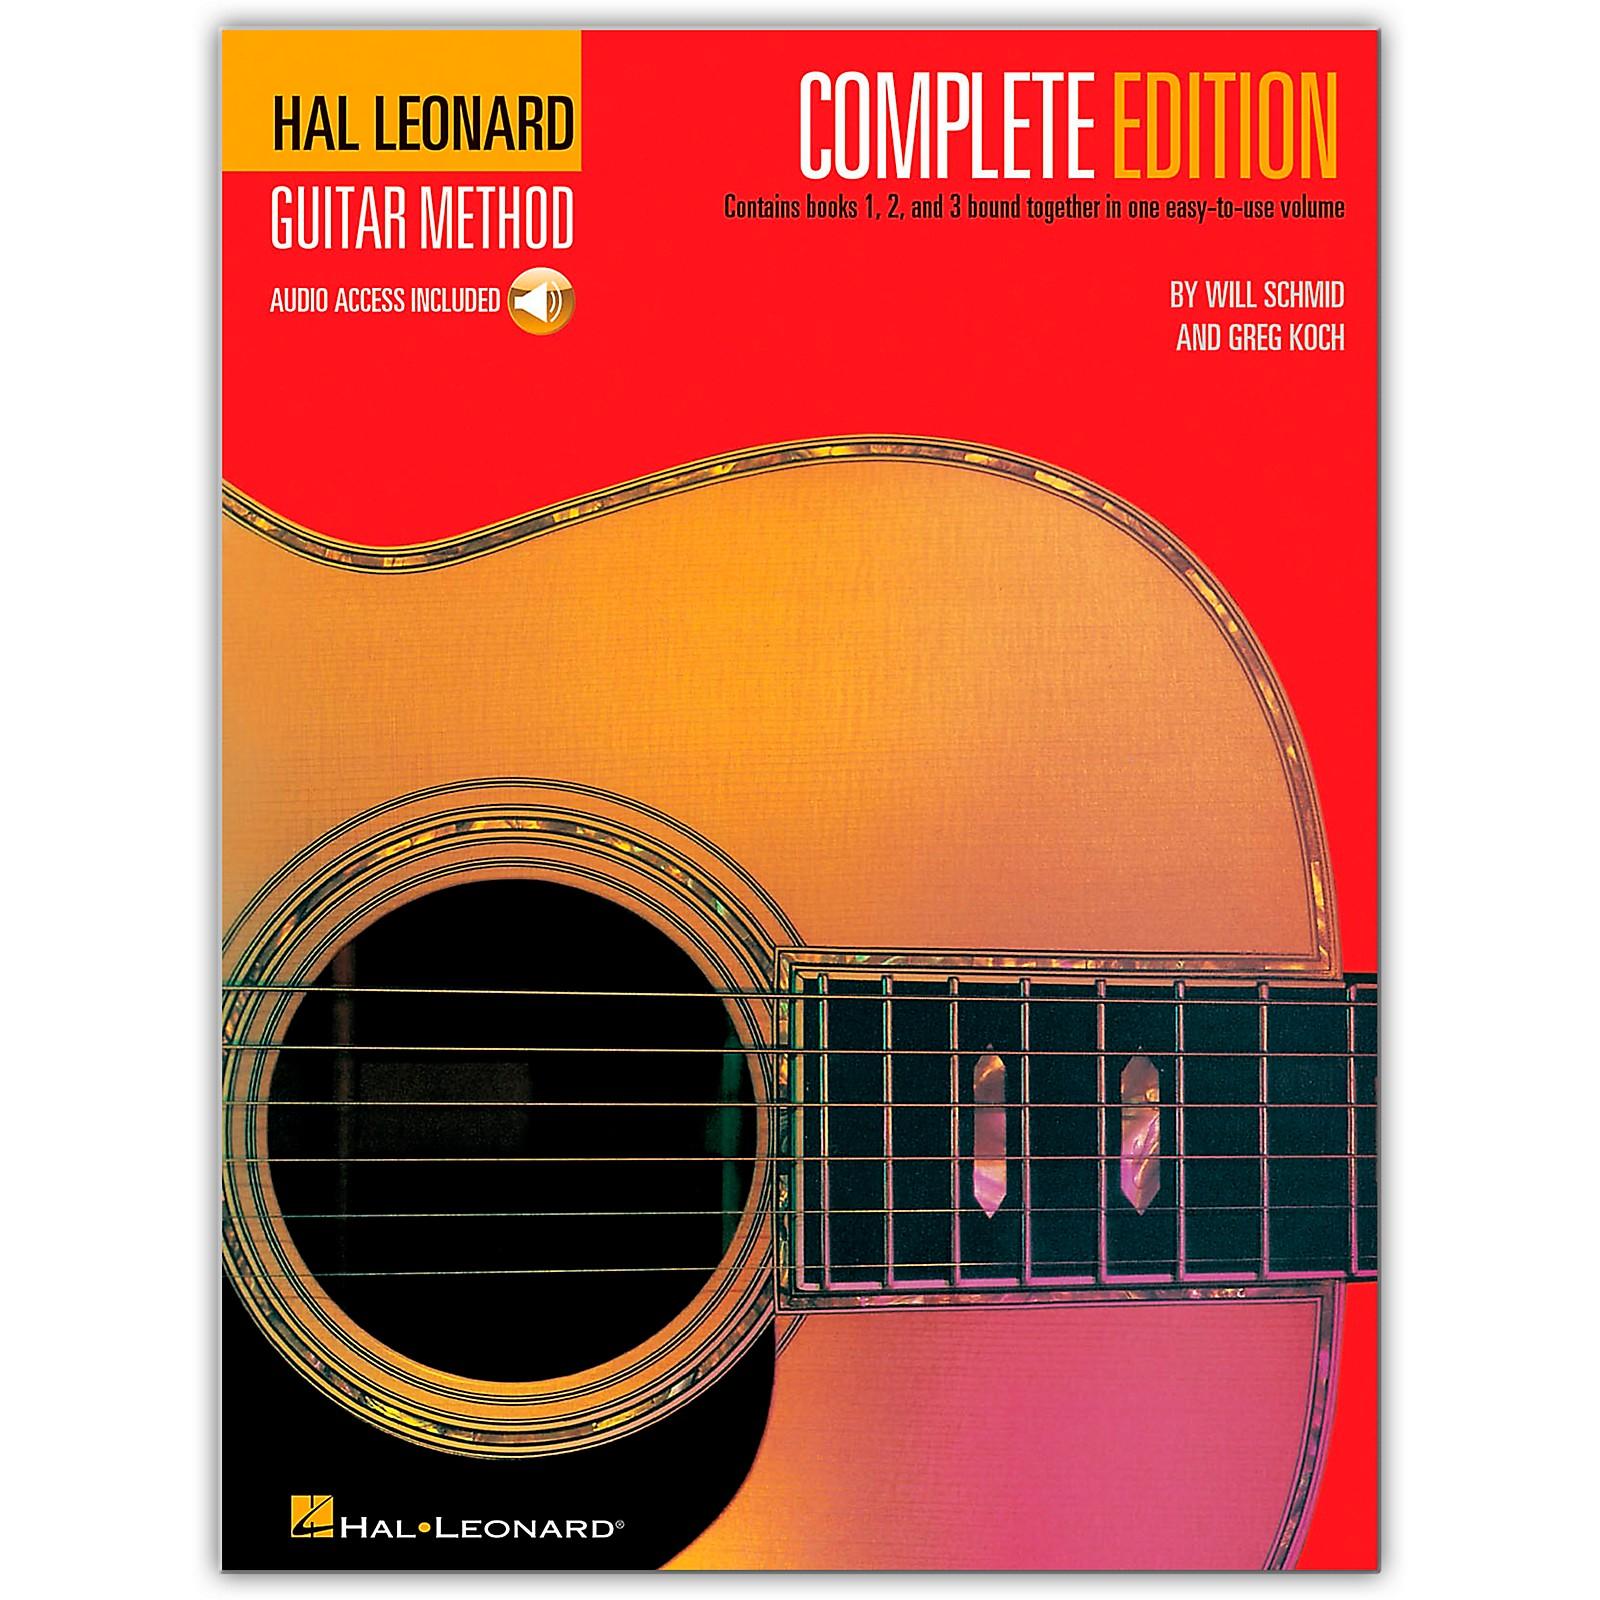 Hal Leonard Guitar Method Complete Edition (Book/Online Audio)